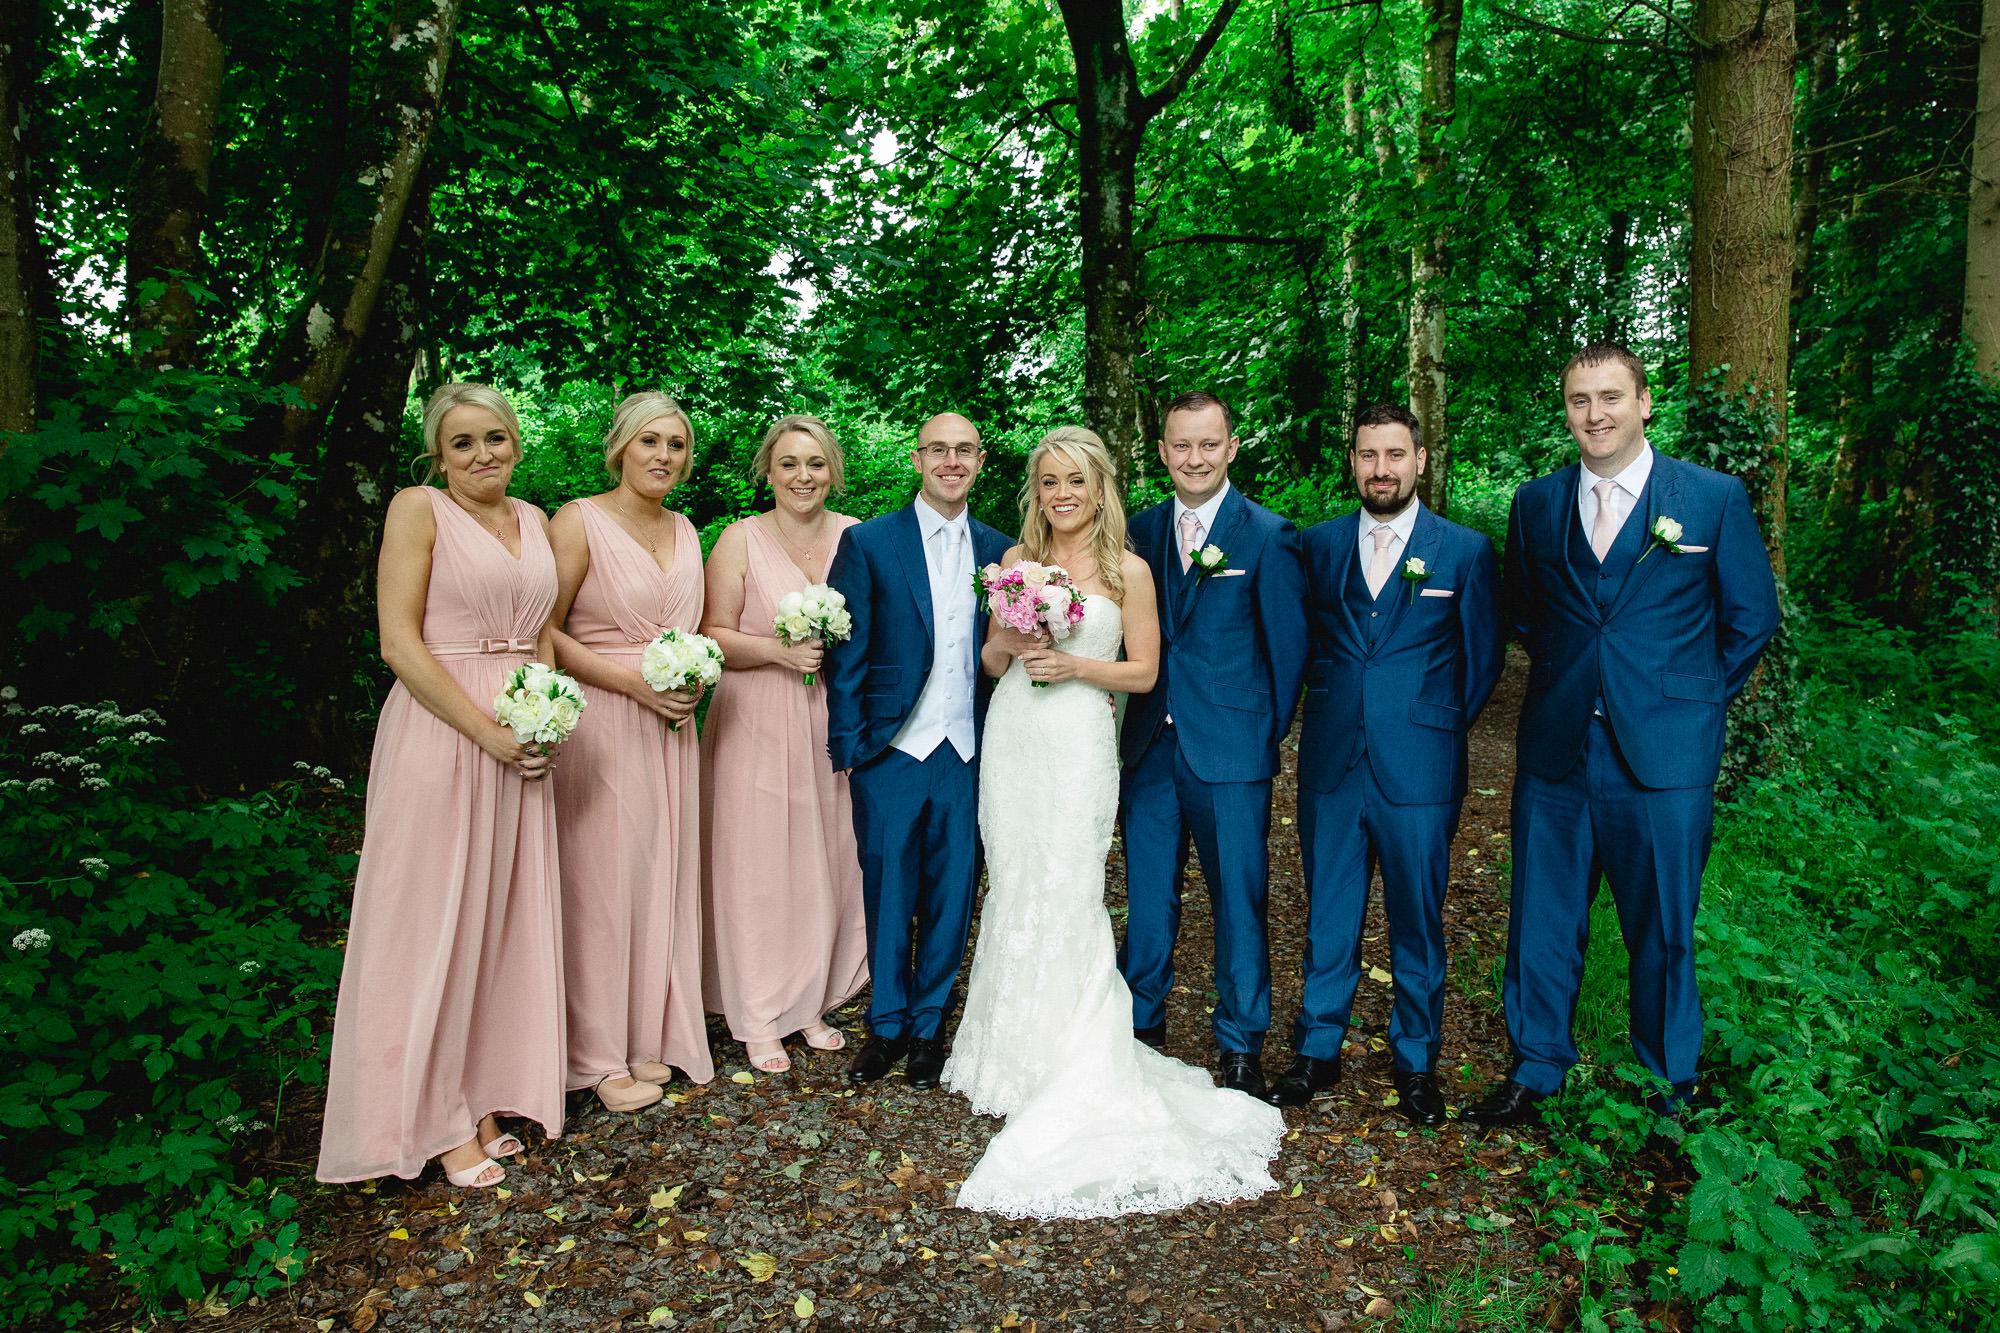 CLAIREBYRNEPHOTOGRAPHY-WEDDING-Ireland-tulffaris-alternative-fun-Lisa-terry-7.jpg